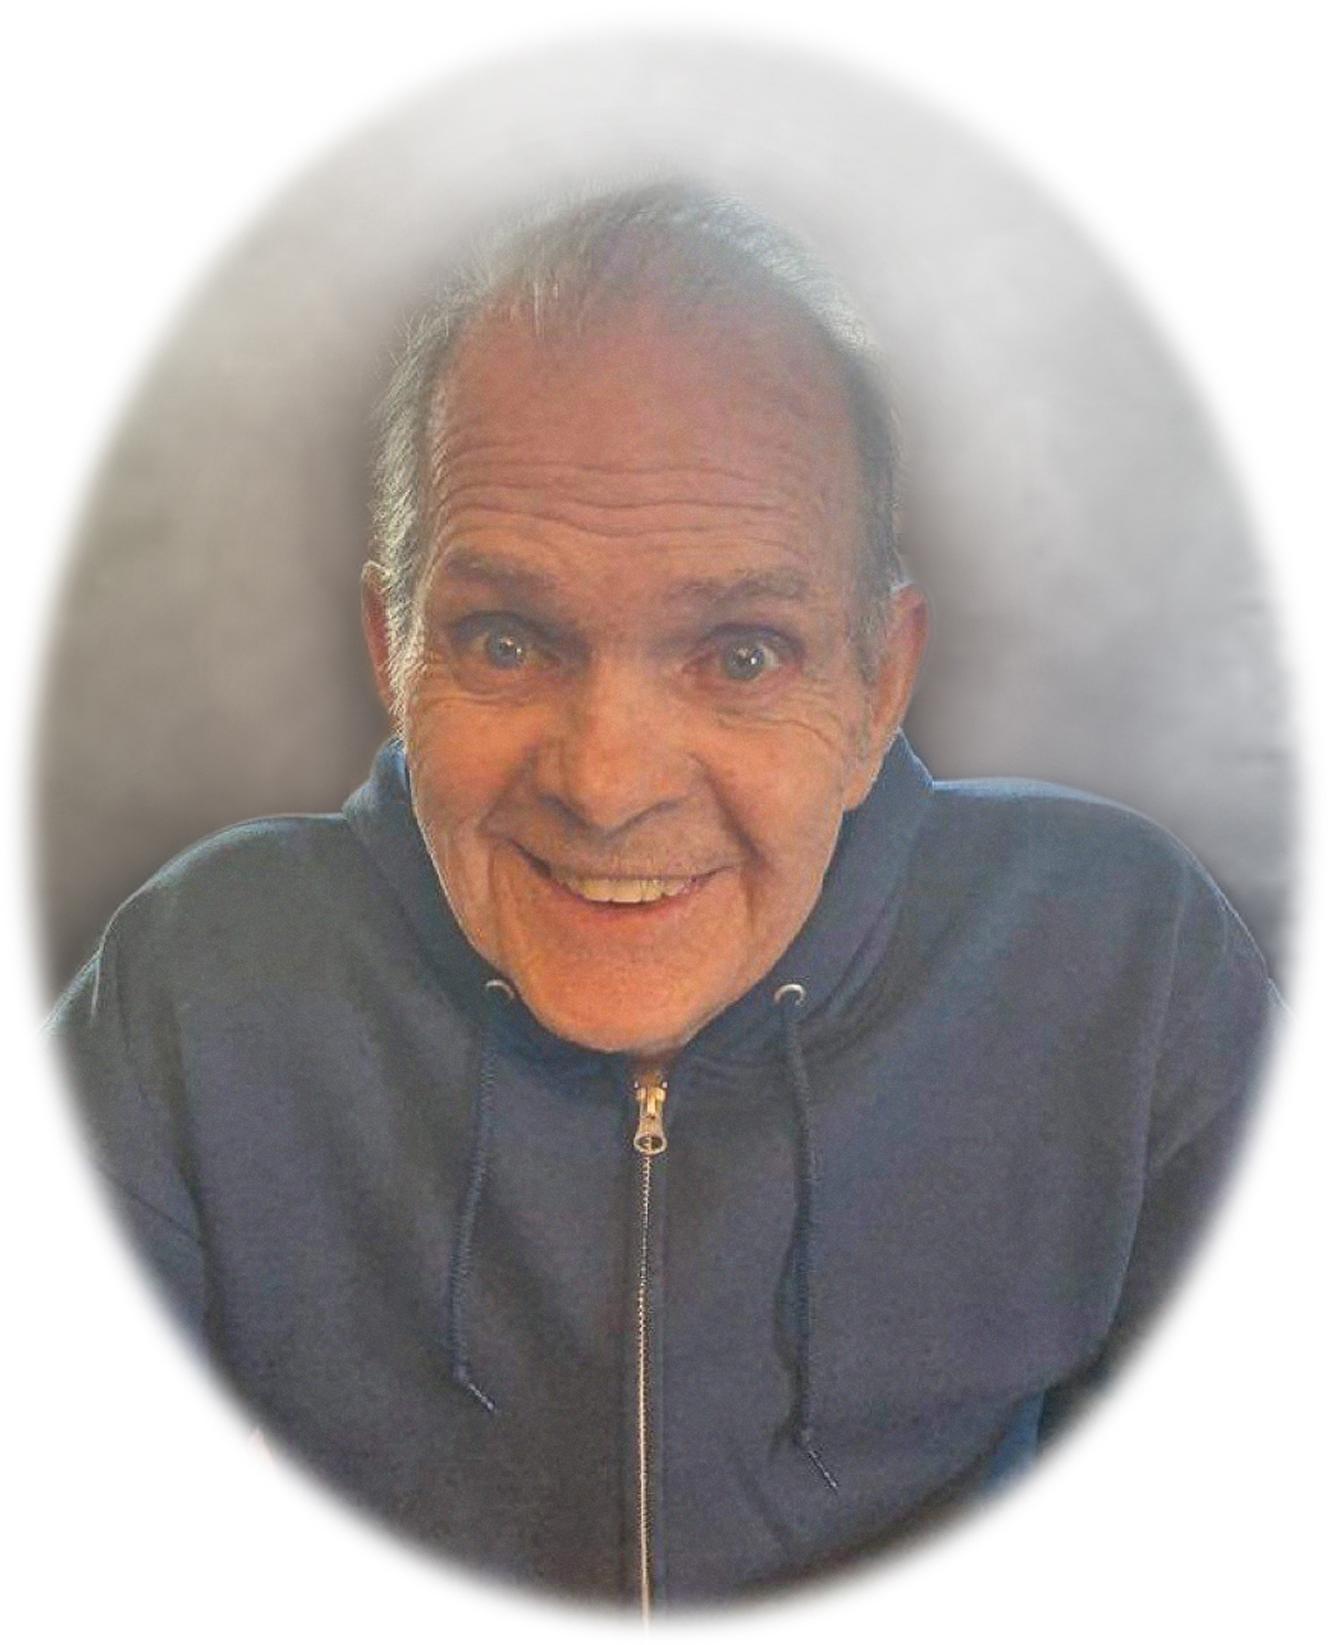 Patrick F. Shannon